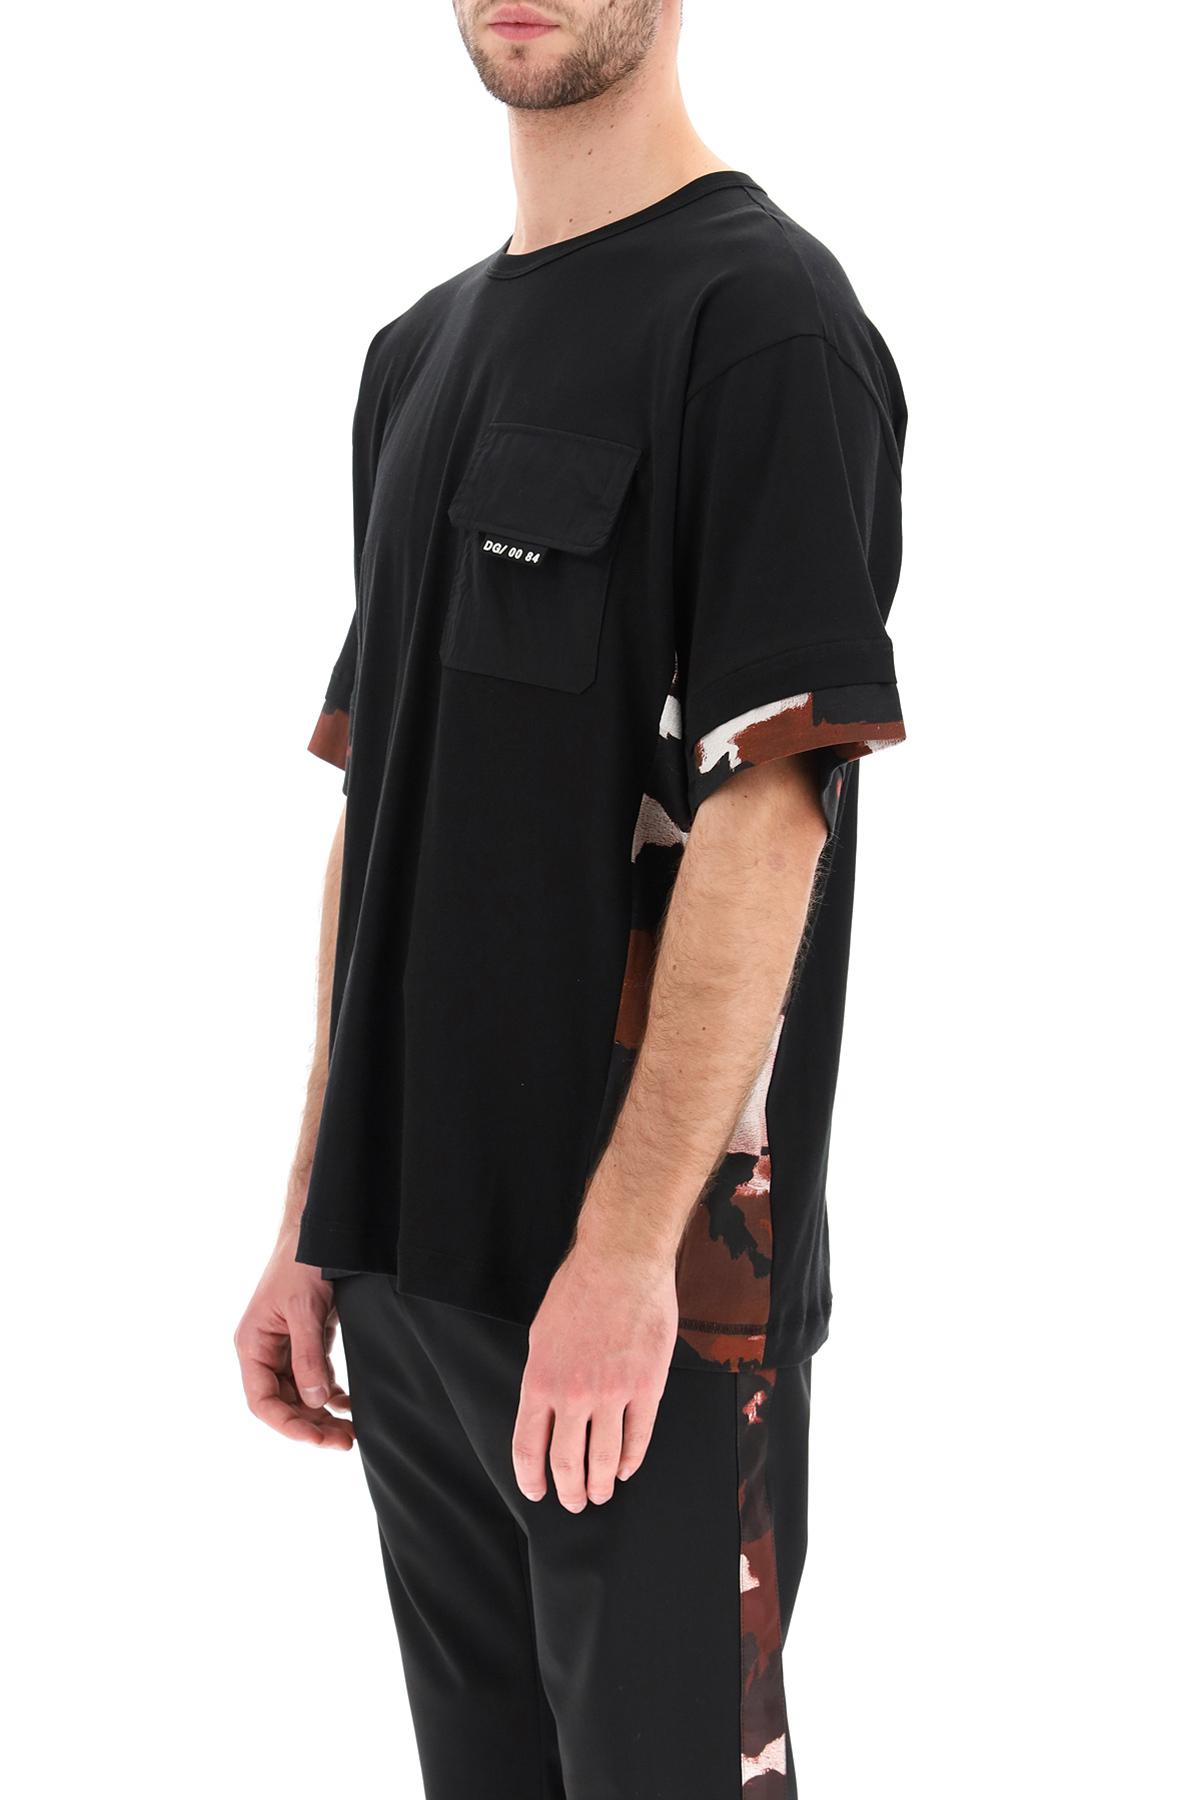 Dolce & gabbana t-shirt con inserti camouflage